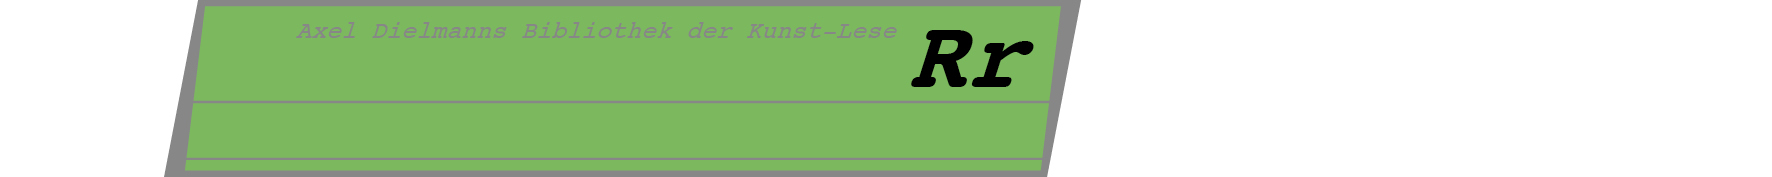 Kartei-R